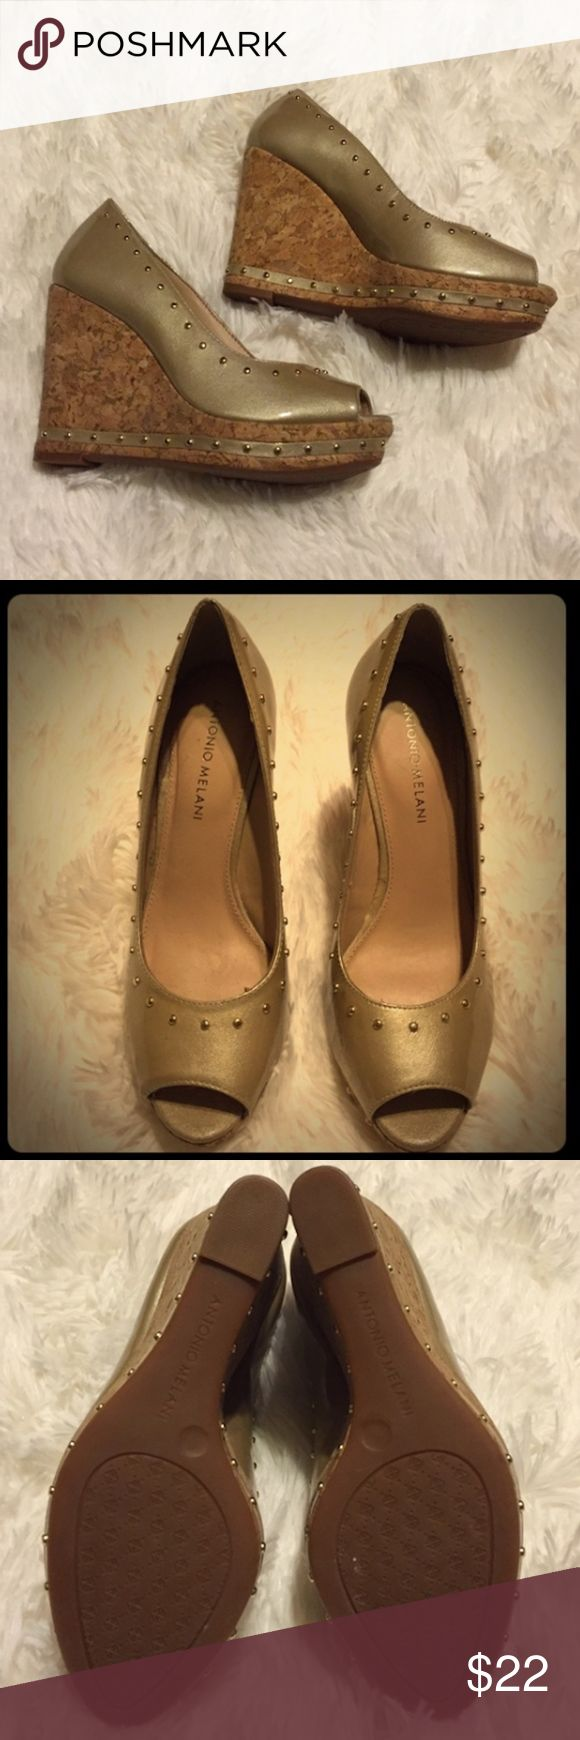 Antonio Melani Gold Platform Wedge Shoes Beautiful  Soft and Comfy Gold Antonio Melani Platform Wedge Shoes ANTONIO MELANI Shoes Wedges